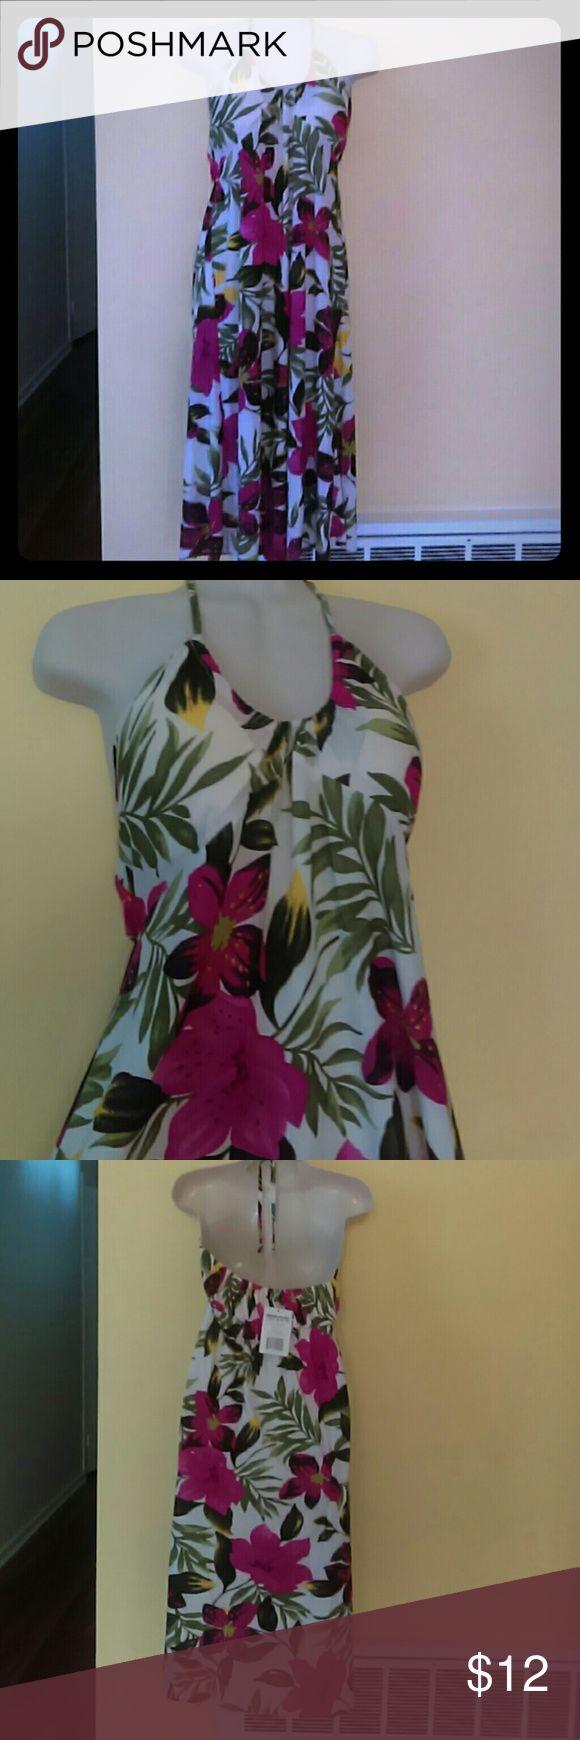 Summer dress Midi summer dress.  Padded front and neck tie adjustable strap Dresses Midi